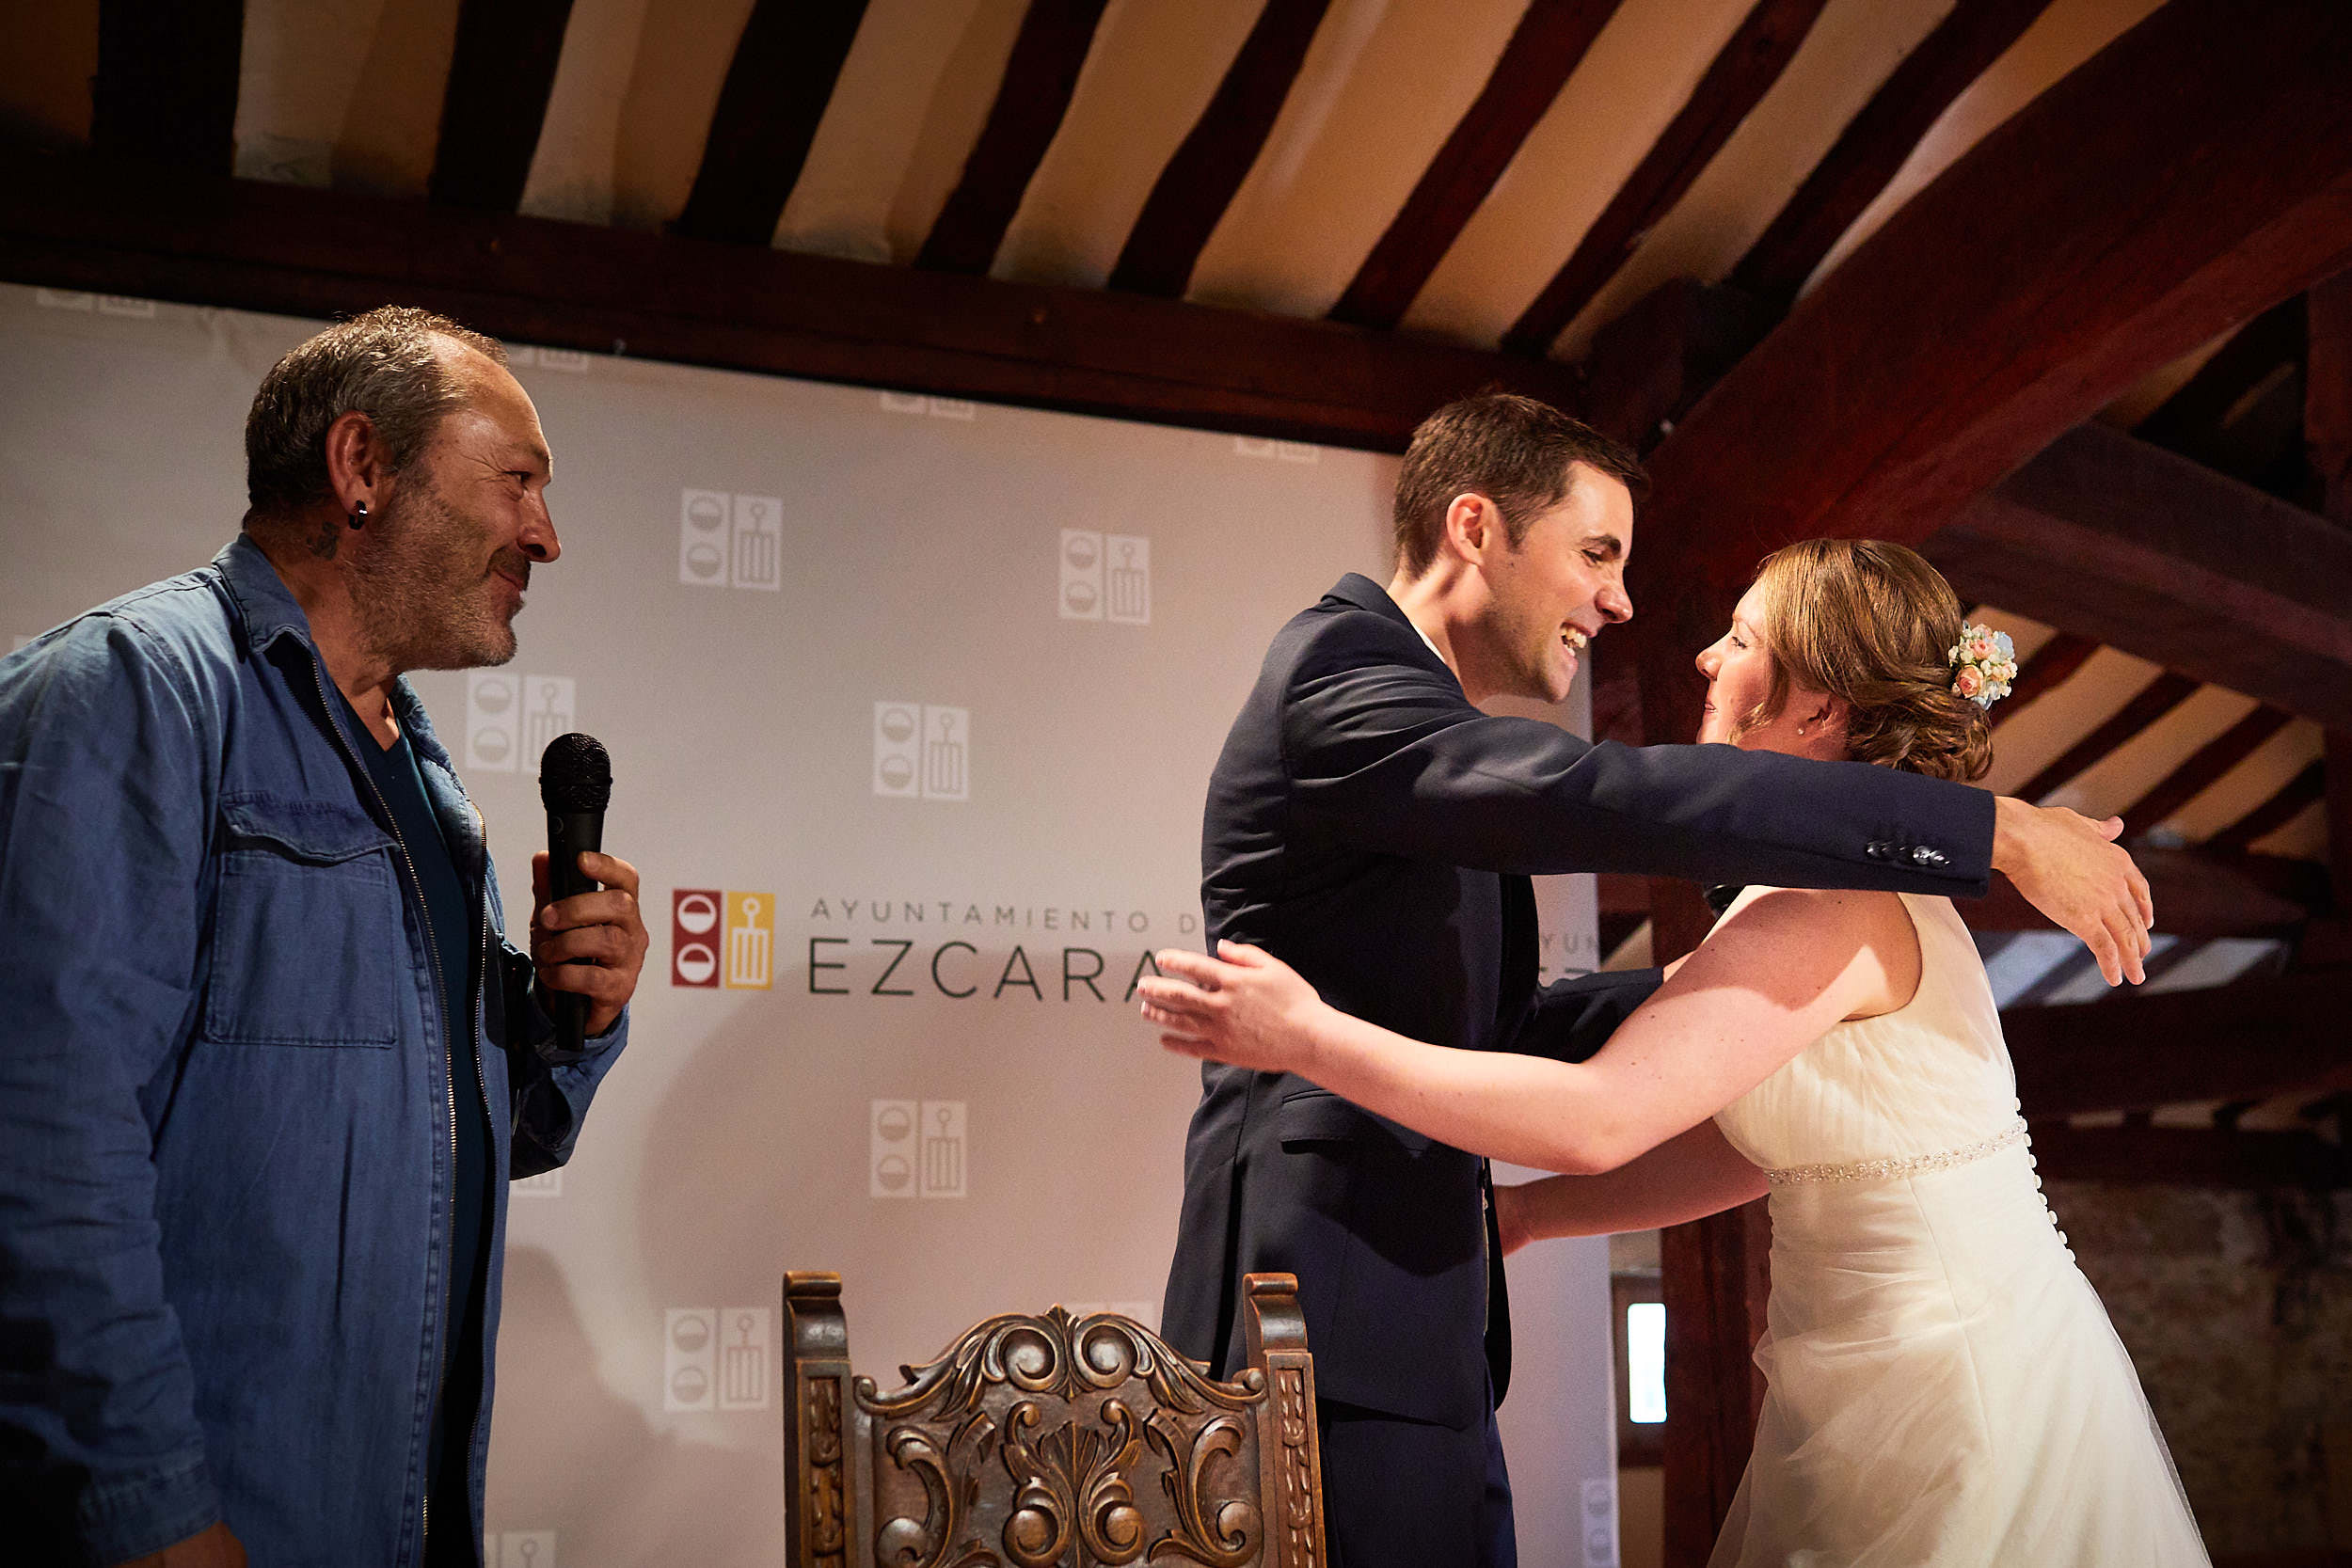 1705Boda_Palacio_Azcarate_Ezcaray_La_Rioja_Spain_0006.jpg